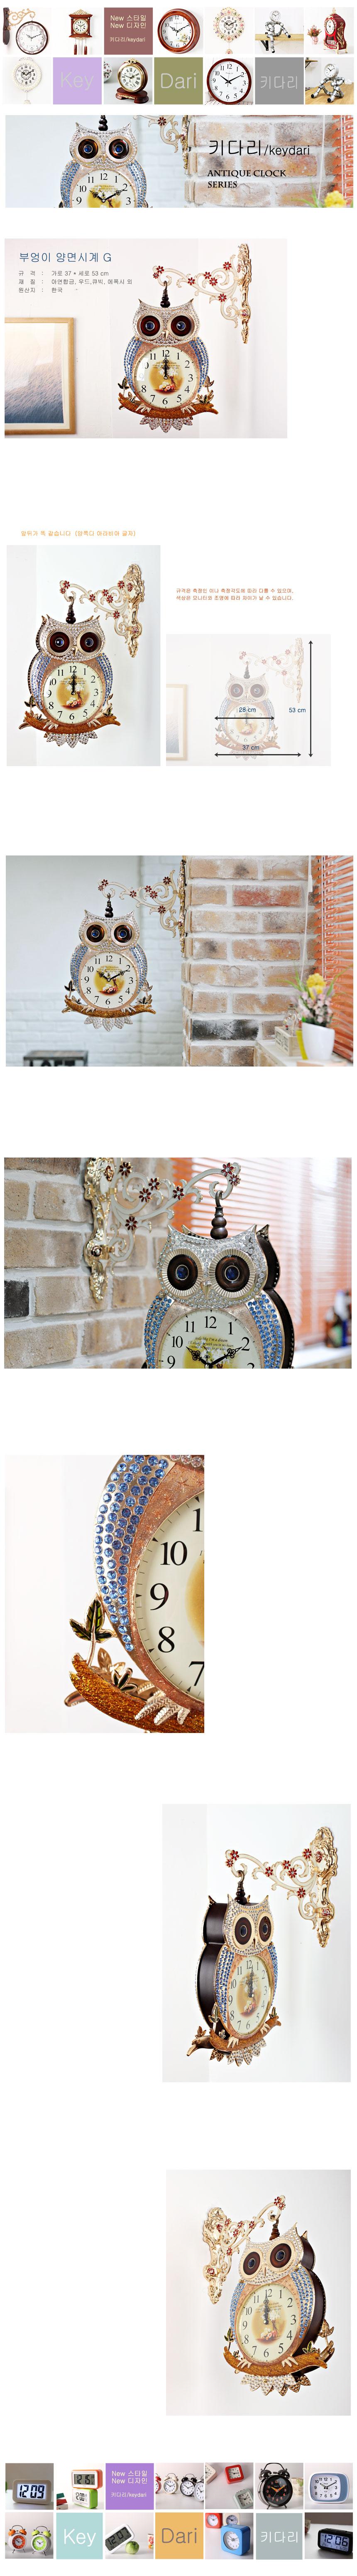 (kmk008)부엉이 양면시계 G123,000원-키다리인테리어, 시계, 벽시계, 양면/스탠딩벽시계바보사랑(kmk008)부엉이 양면시계 G123,000원-키다리인테리어, 시계, 벽시계, 양면/스탠딩벽시계바보사랑